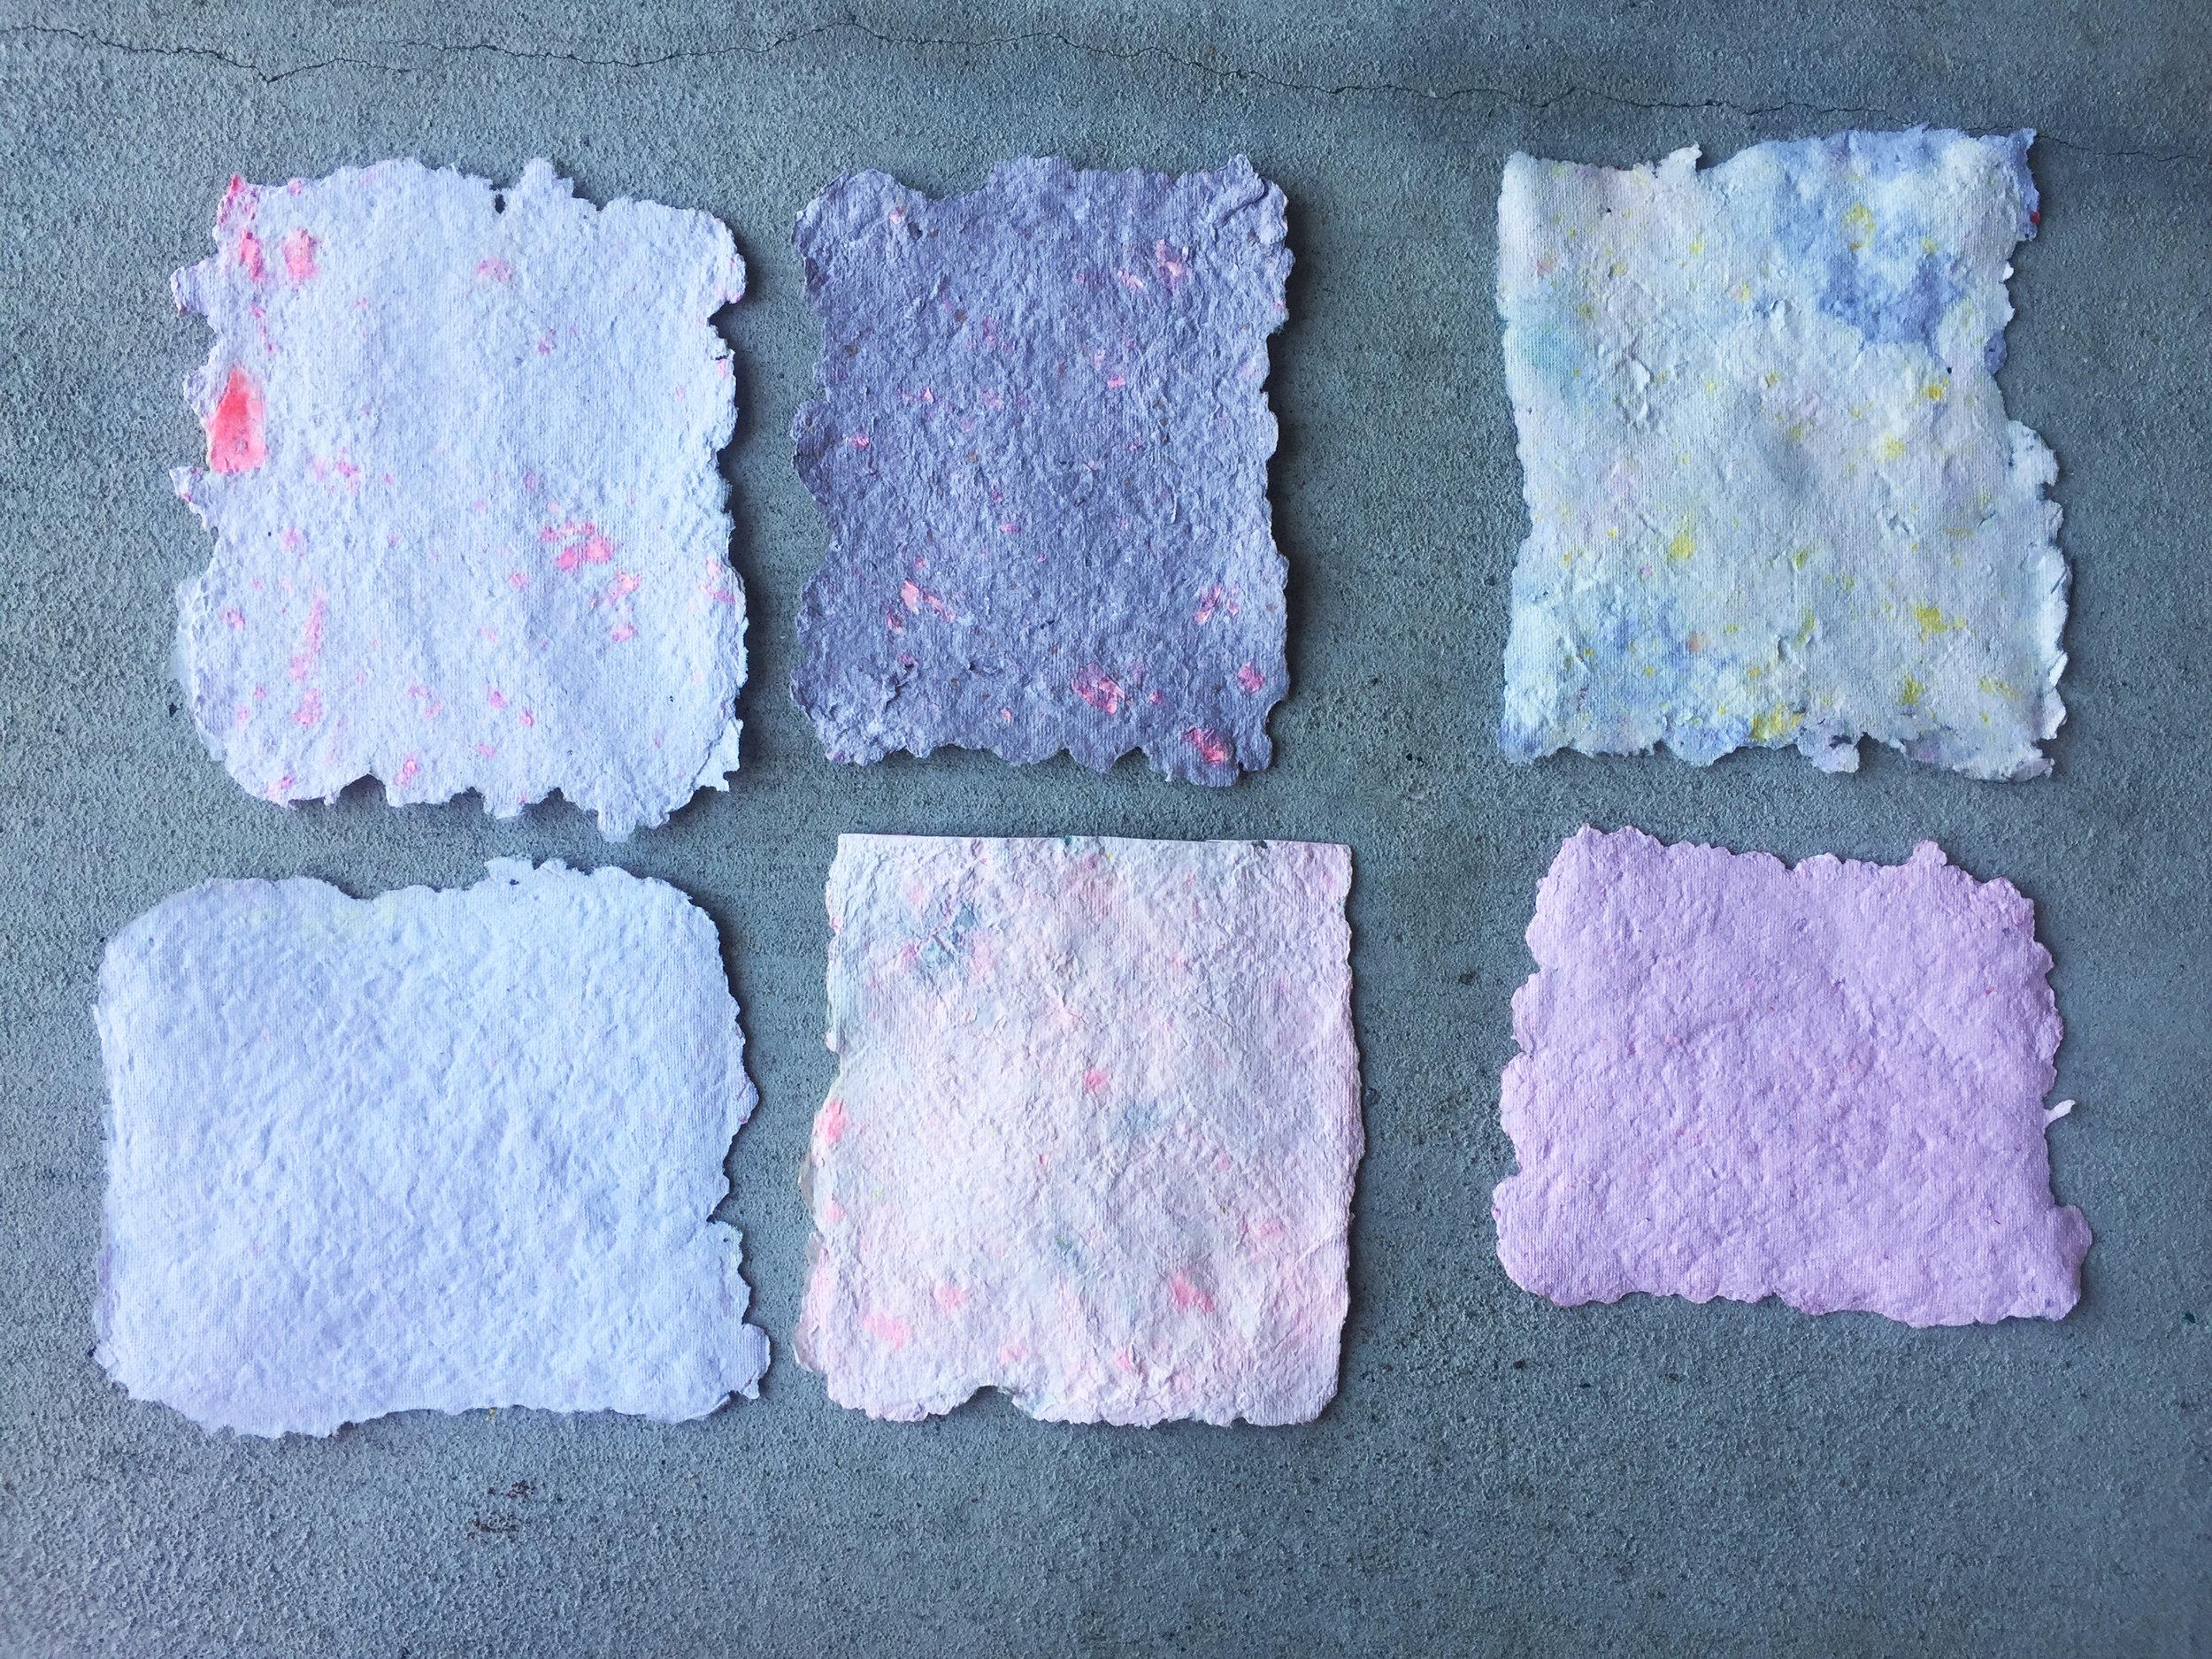 becky jewell handmade paper.jpg